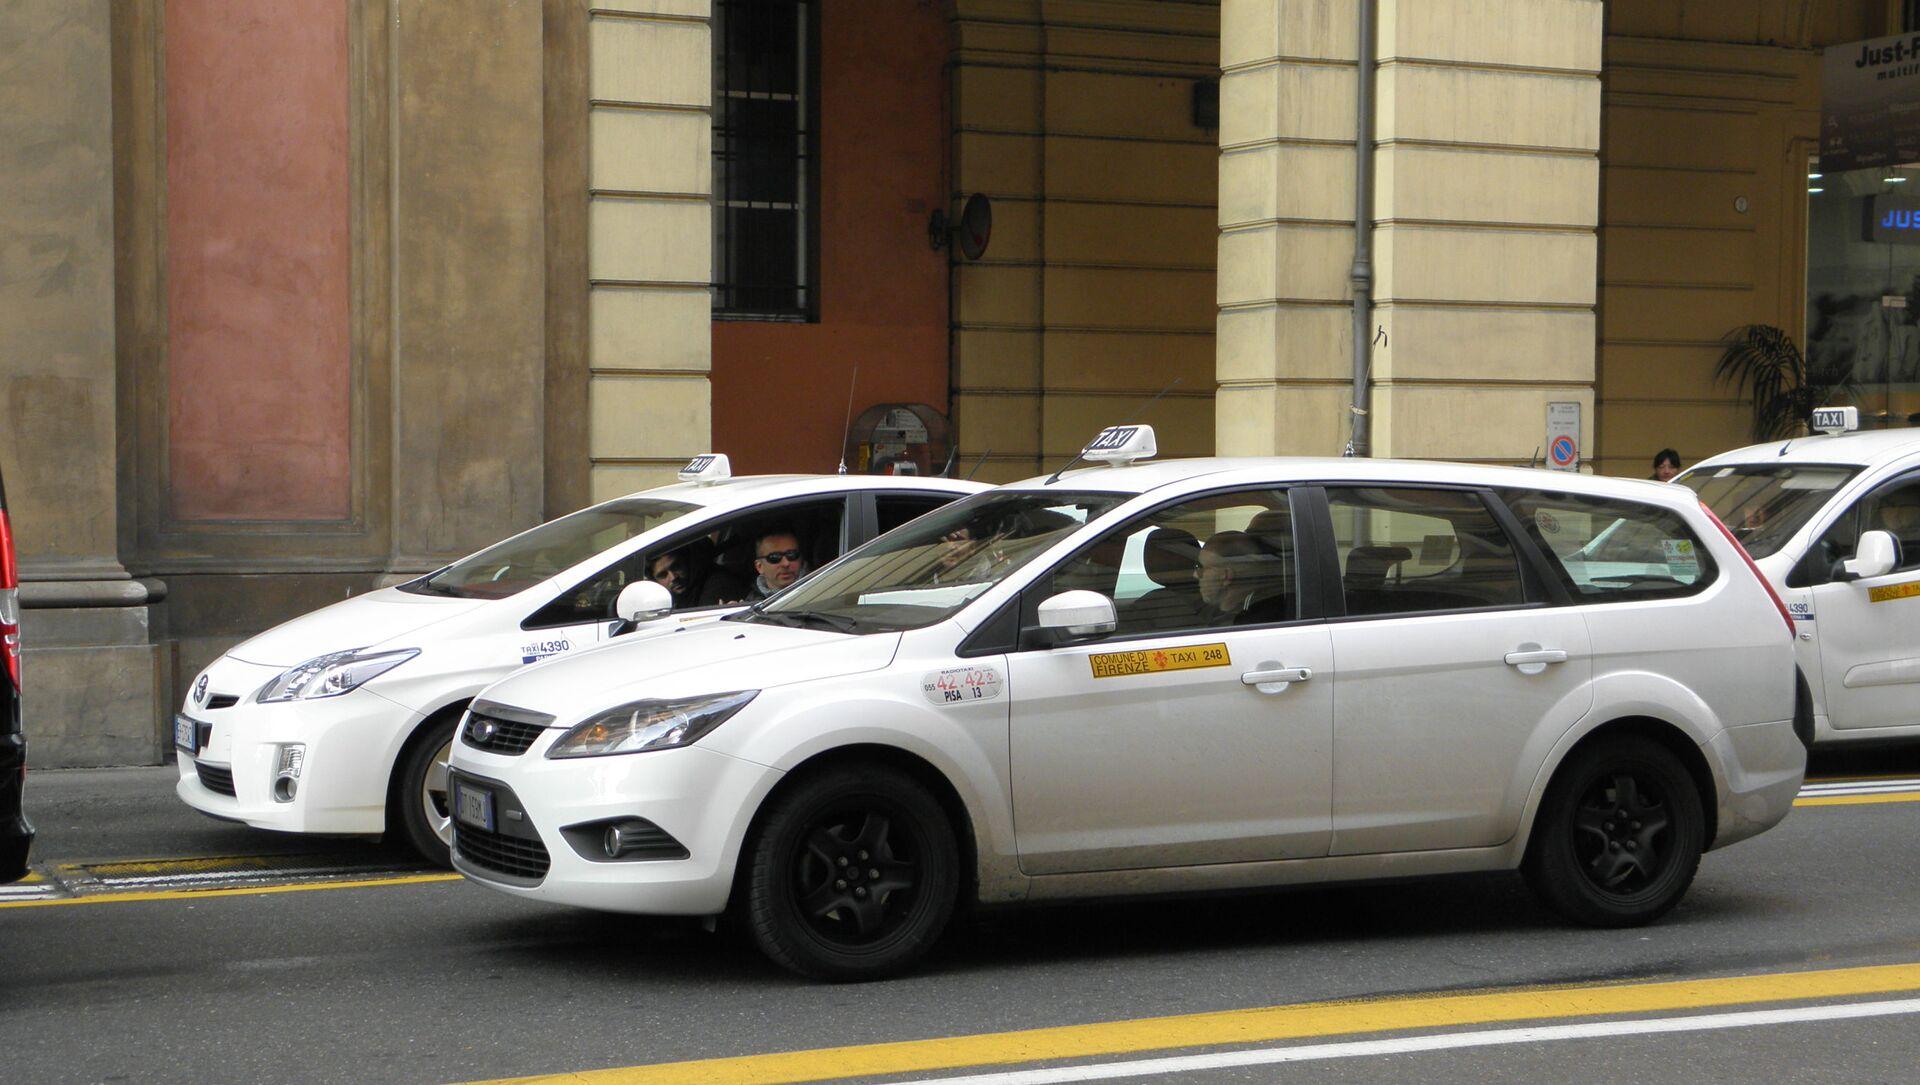 Taxi in Italia - Sputnik Italia, 1920, 07.04.2021